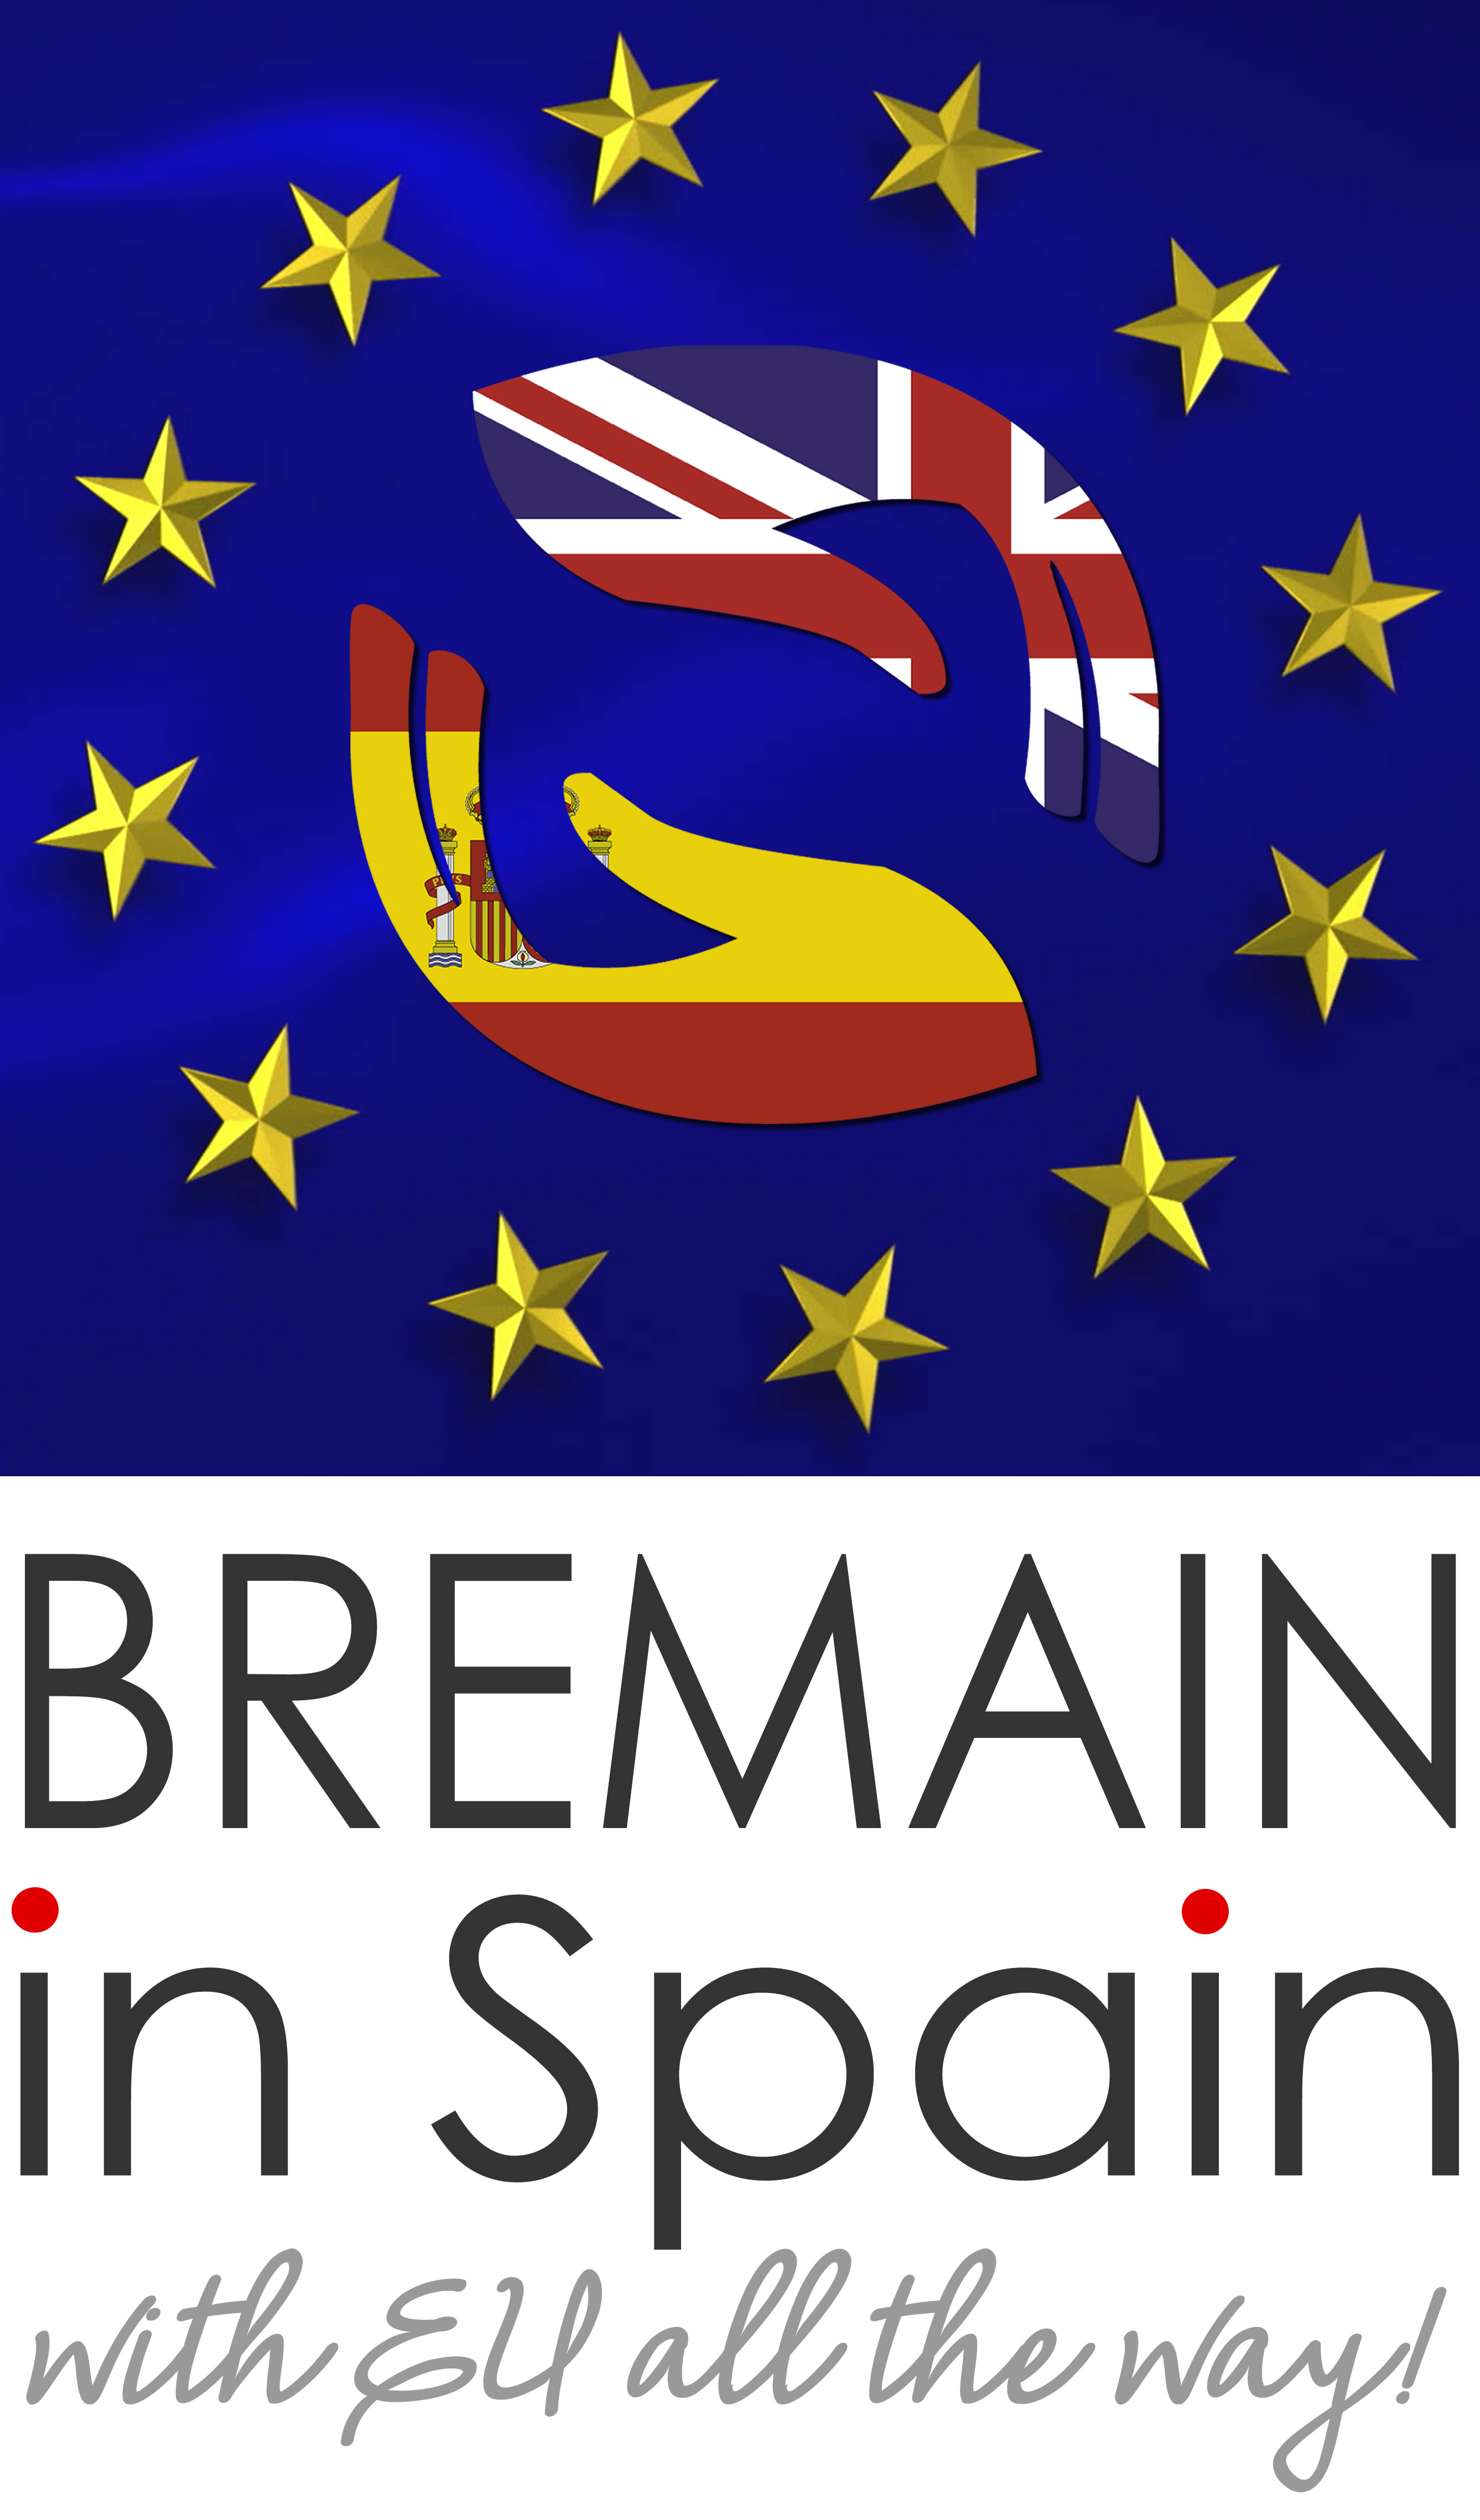 Pro-EU Groups - Bremain in Spain